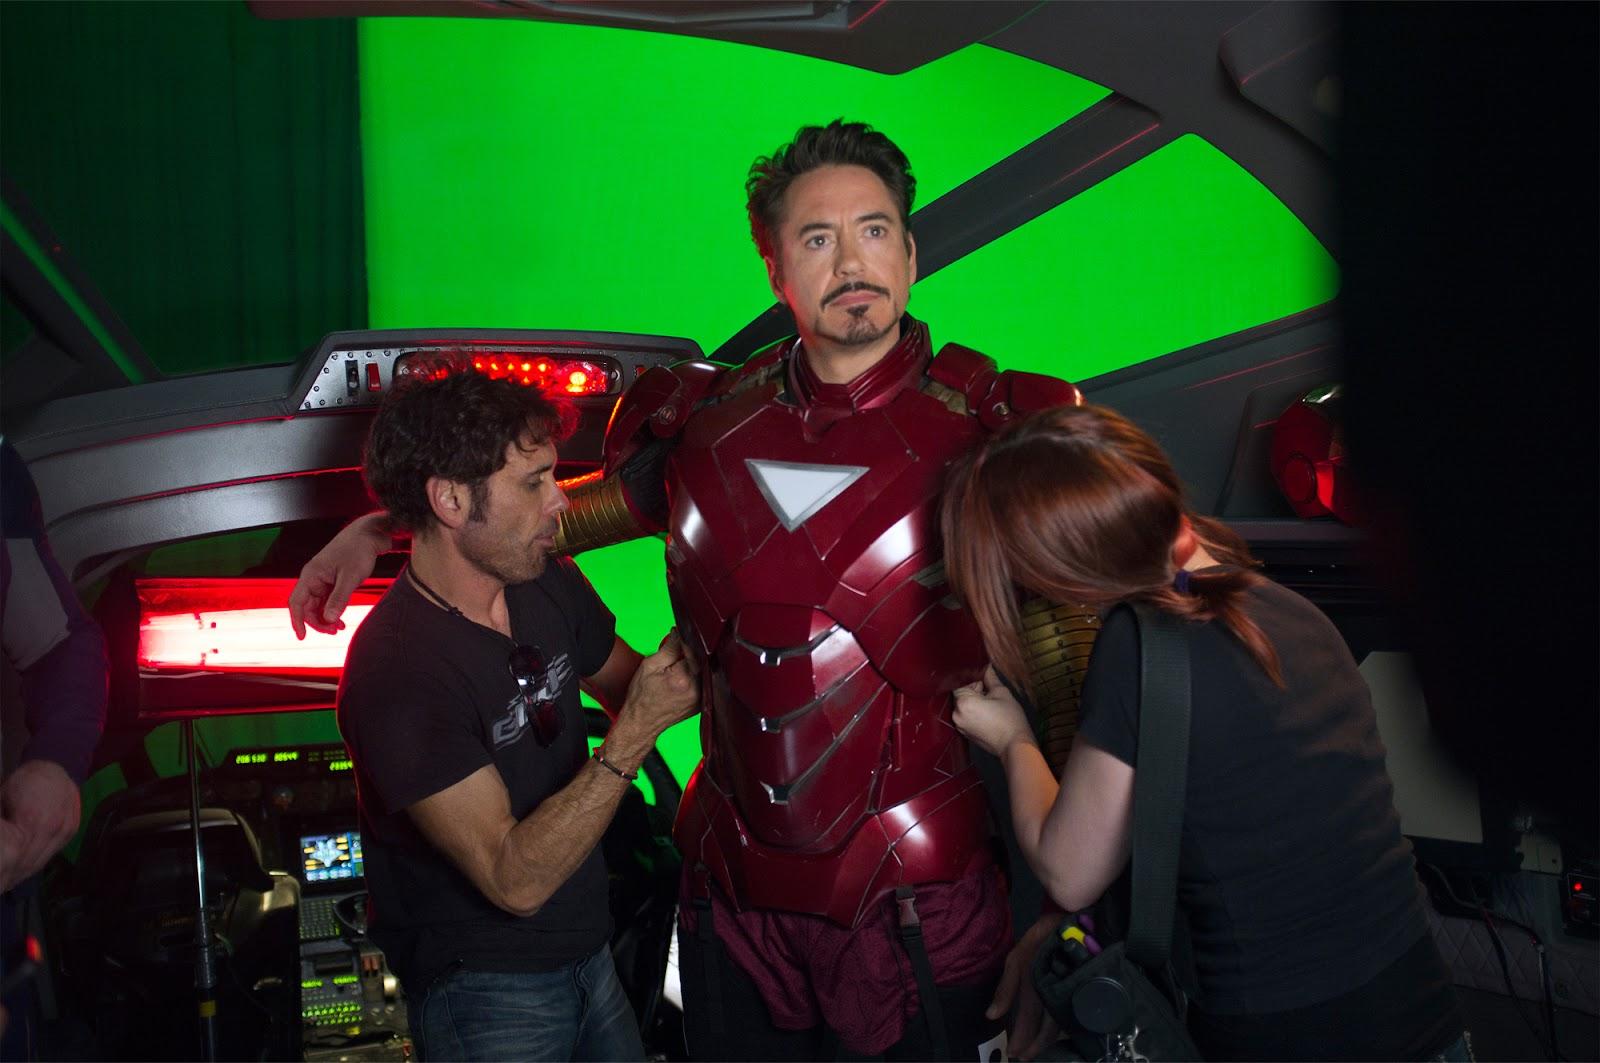 http://1.bp.blogspot.com/-T1X5qG73f4k/T3pd5NX8XDI/AAAAAAAAnSQ/UacND4weJm8/s1600/Robert-Downey-Jr-Iron-Man-The-Avengers.jpg